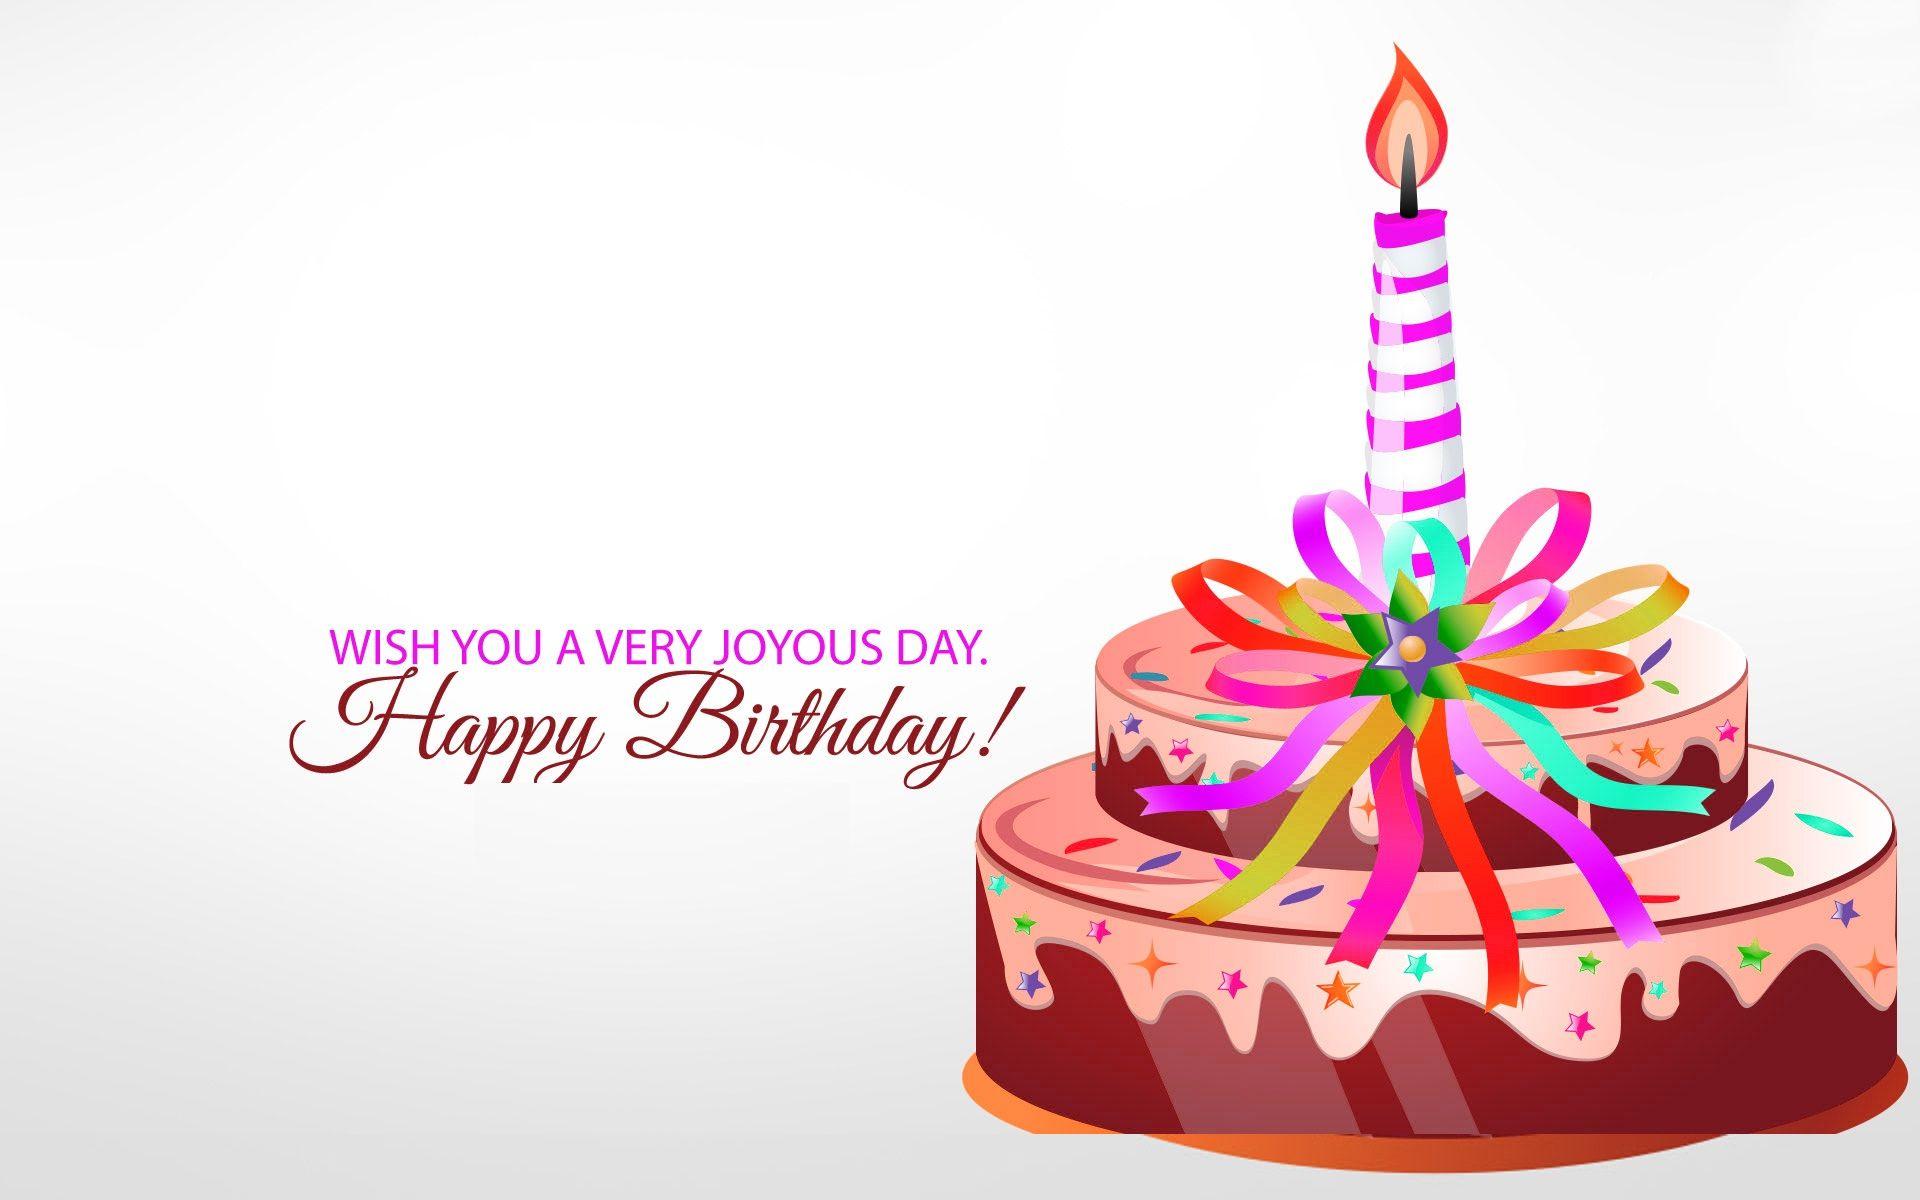 Happy Birthday Wishes Wallpaper s HD